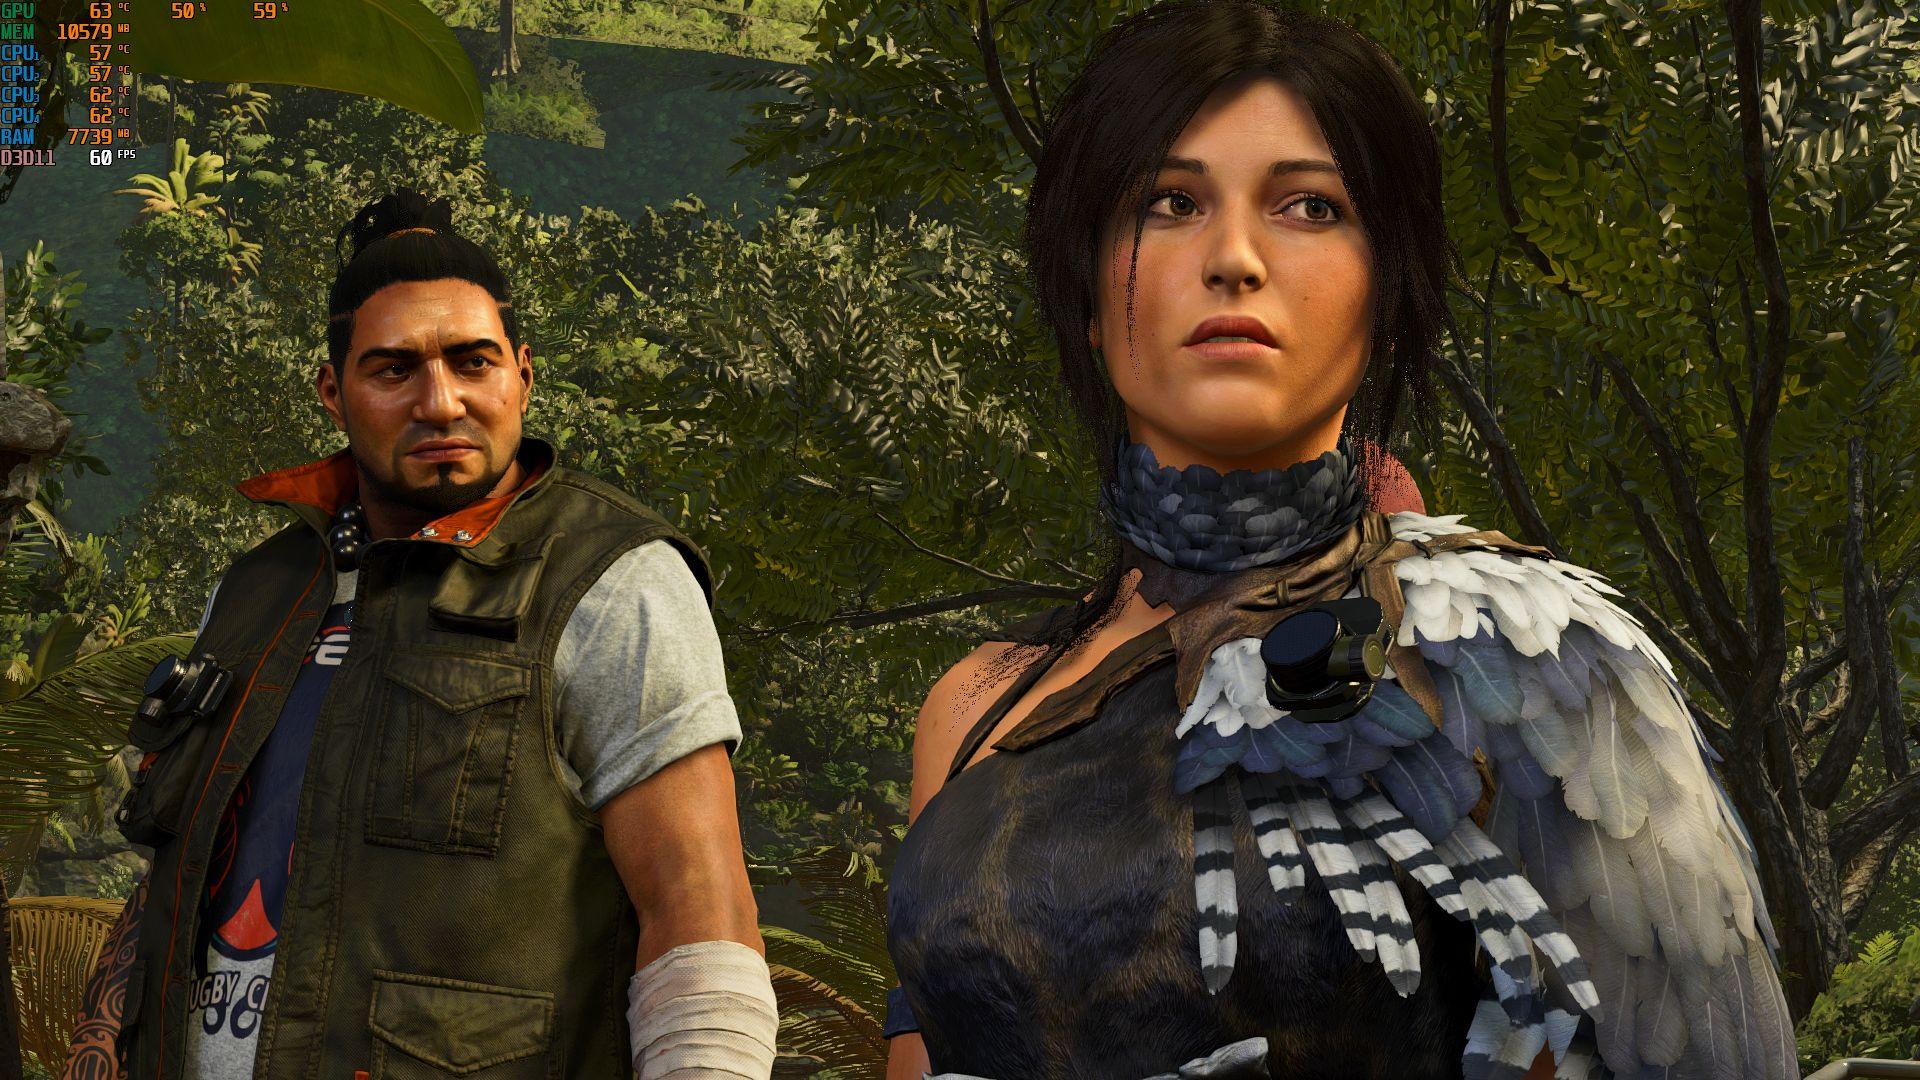 000438.Jpg - Shadow of the Tomb Raider